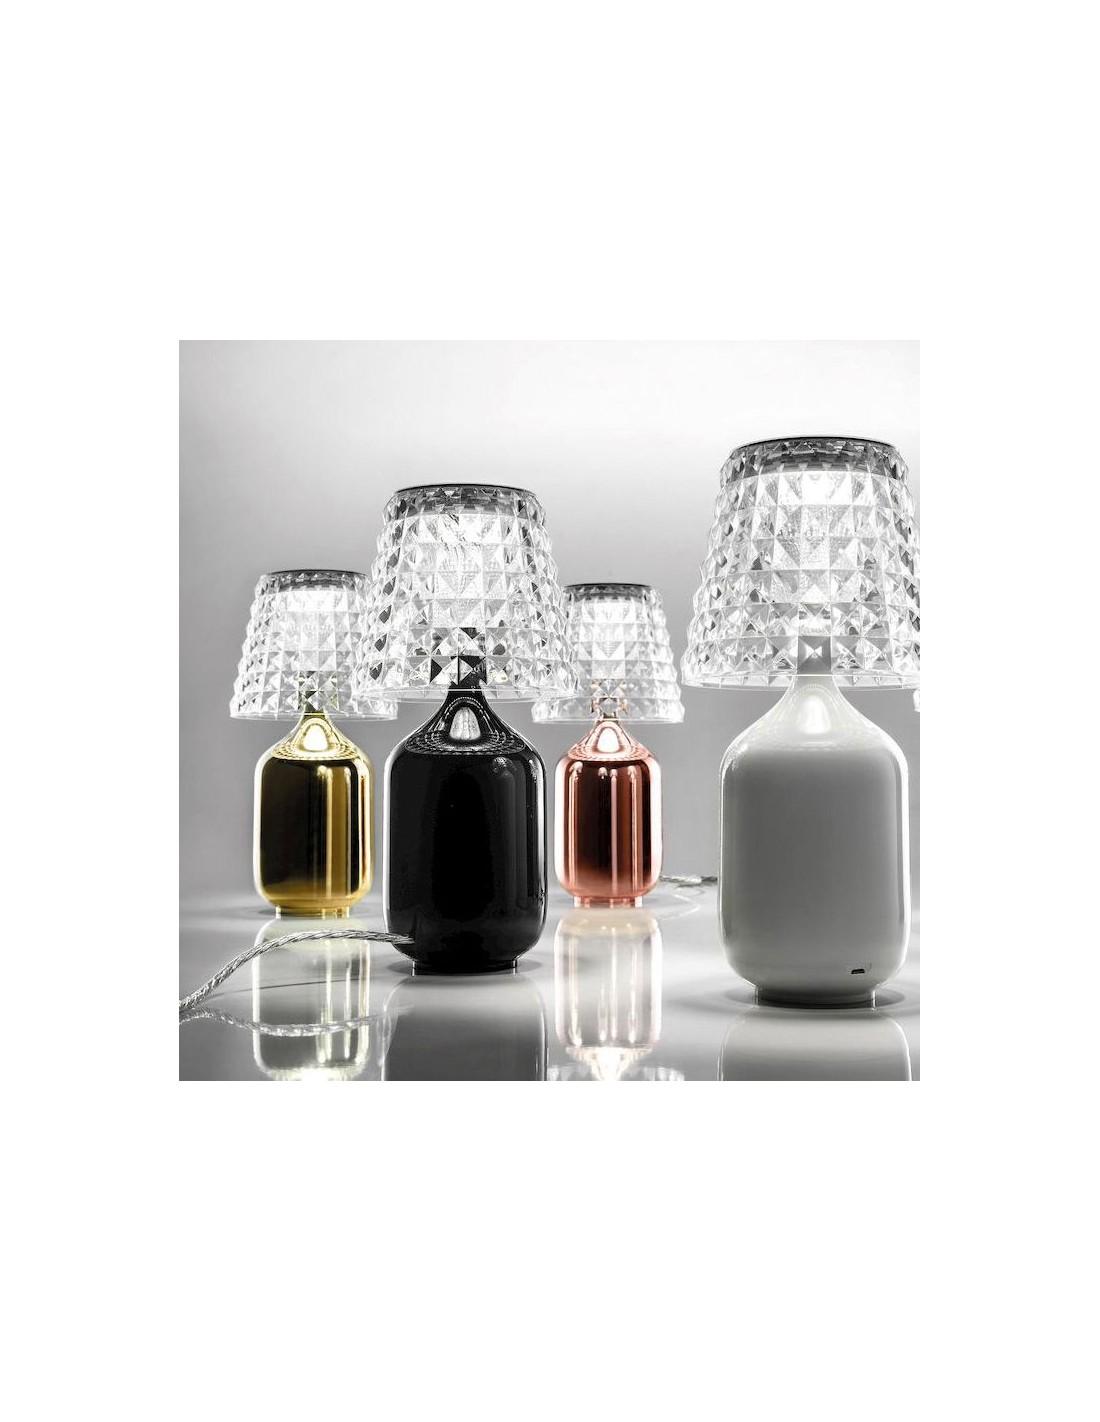 Lampe à poser Valentina collection de Studio Italia Design